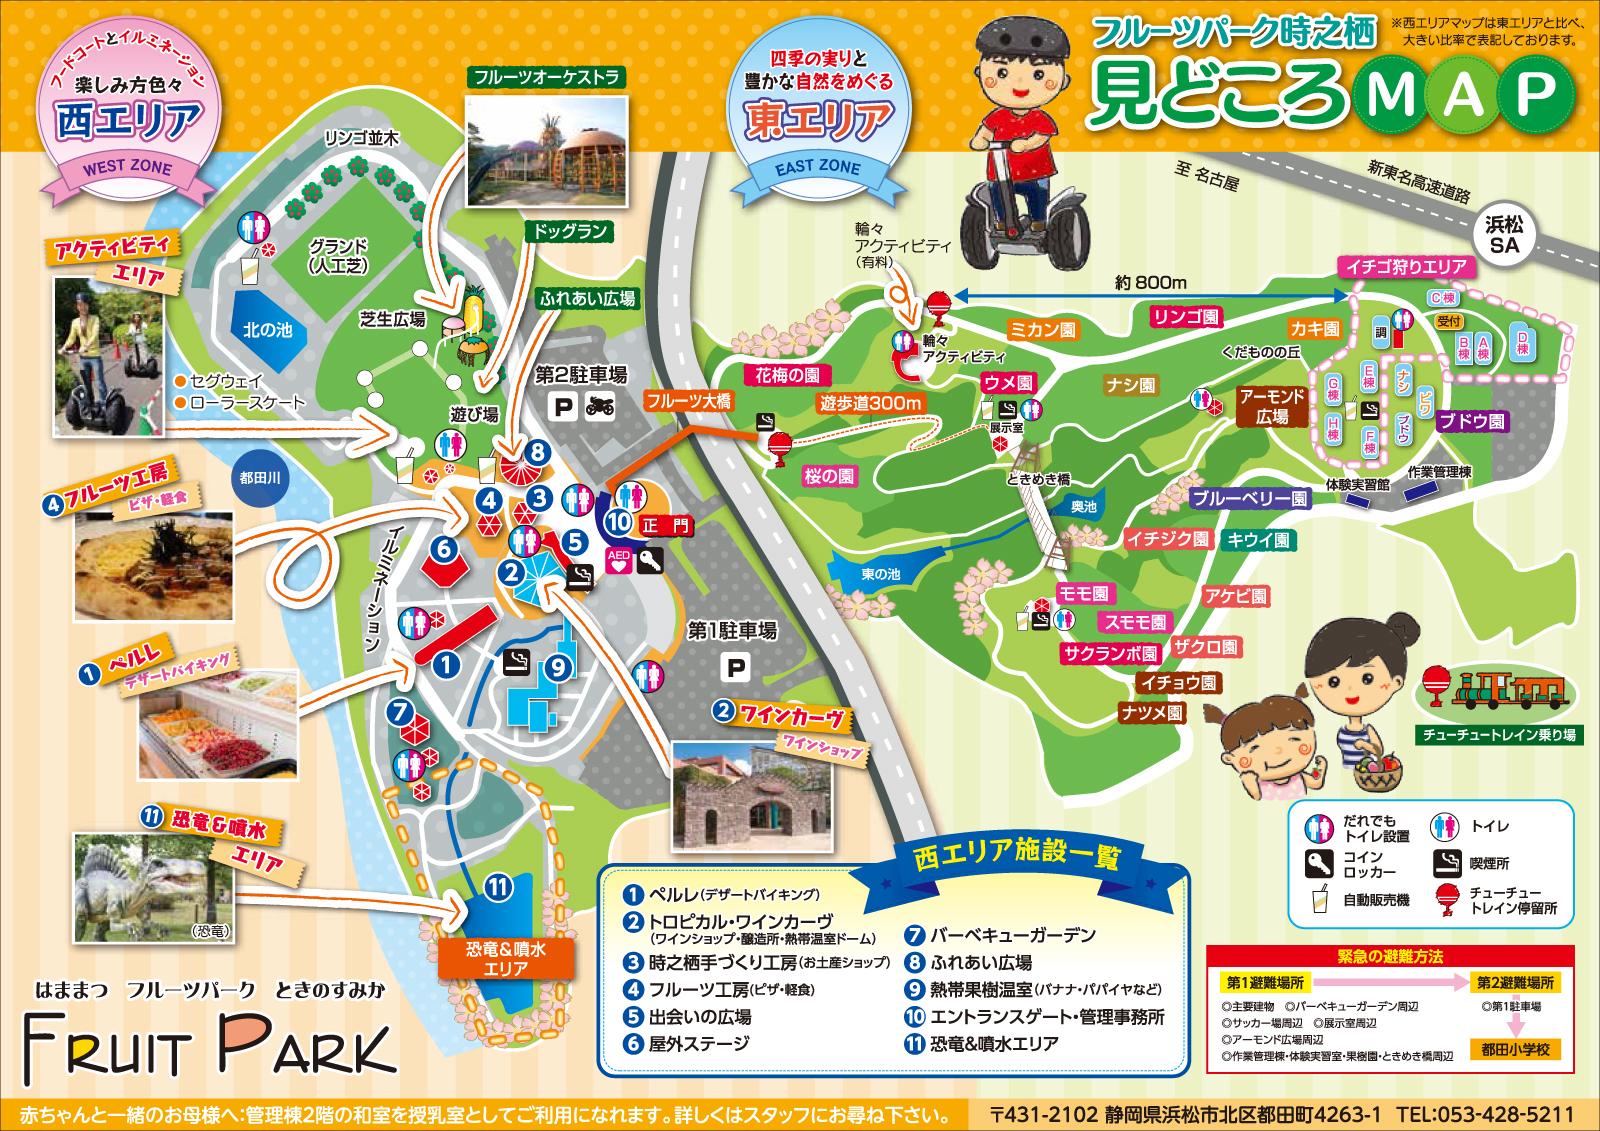 http://www.inhamamatsu.com/activity/hfpt2.jpg